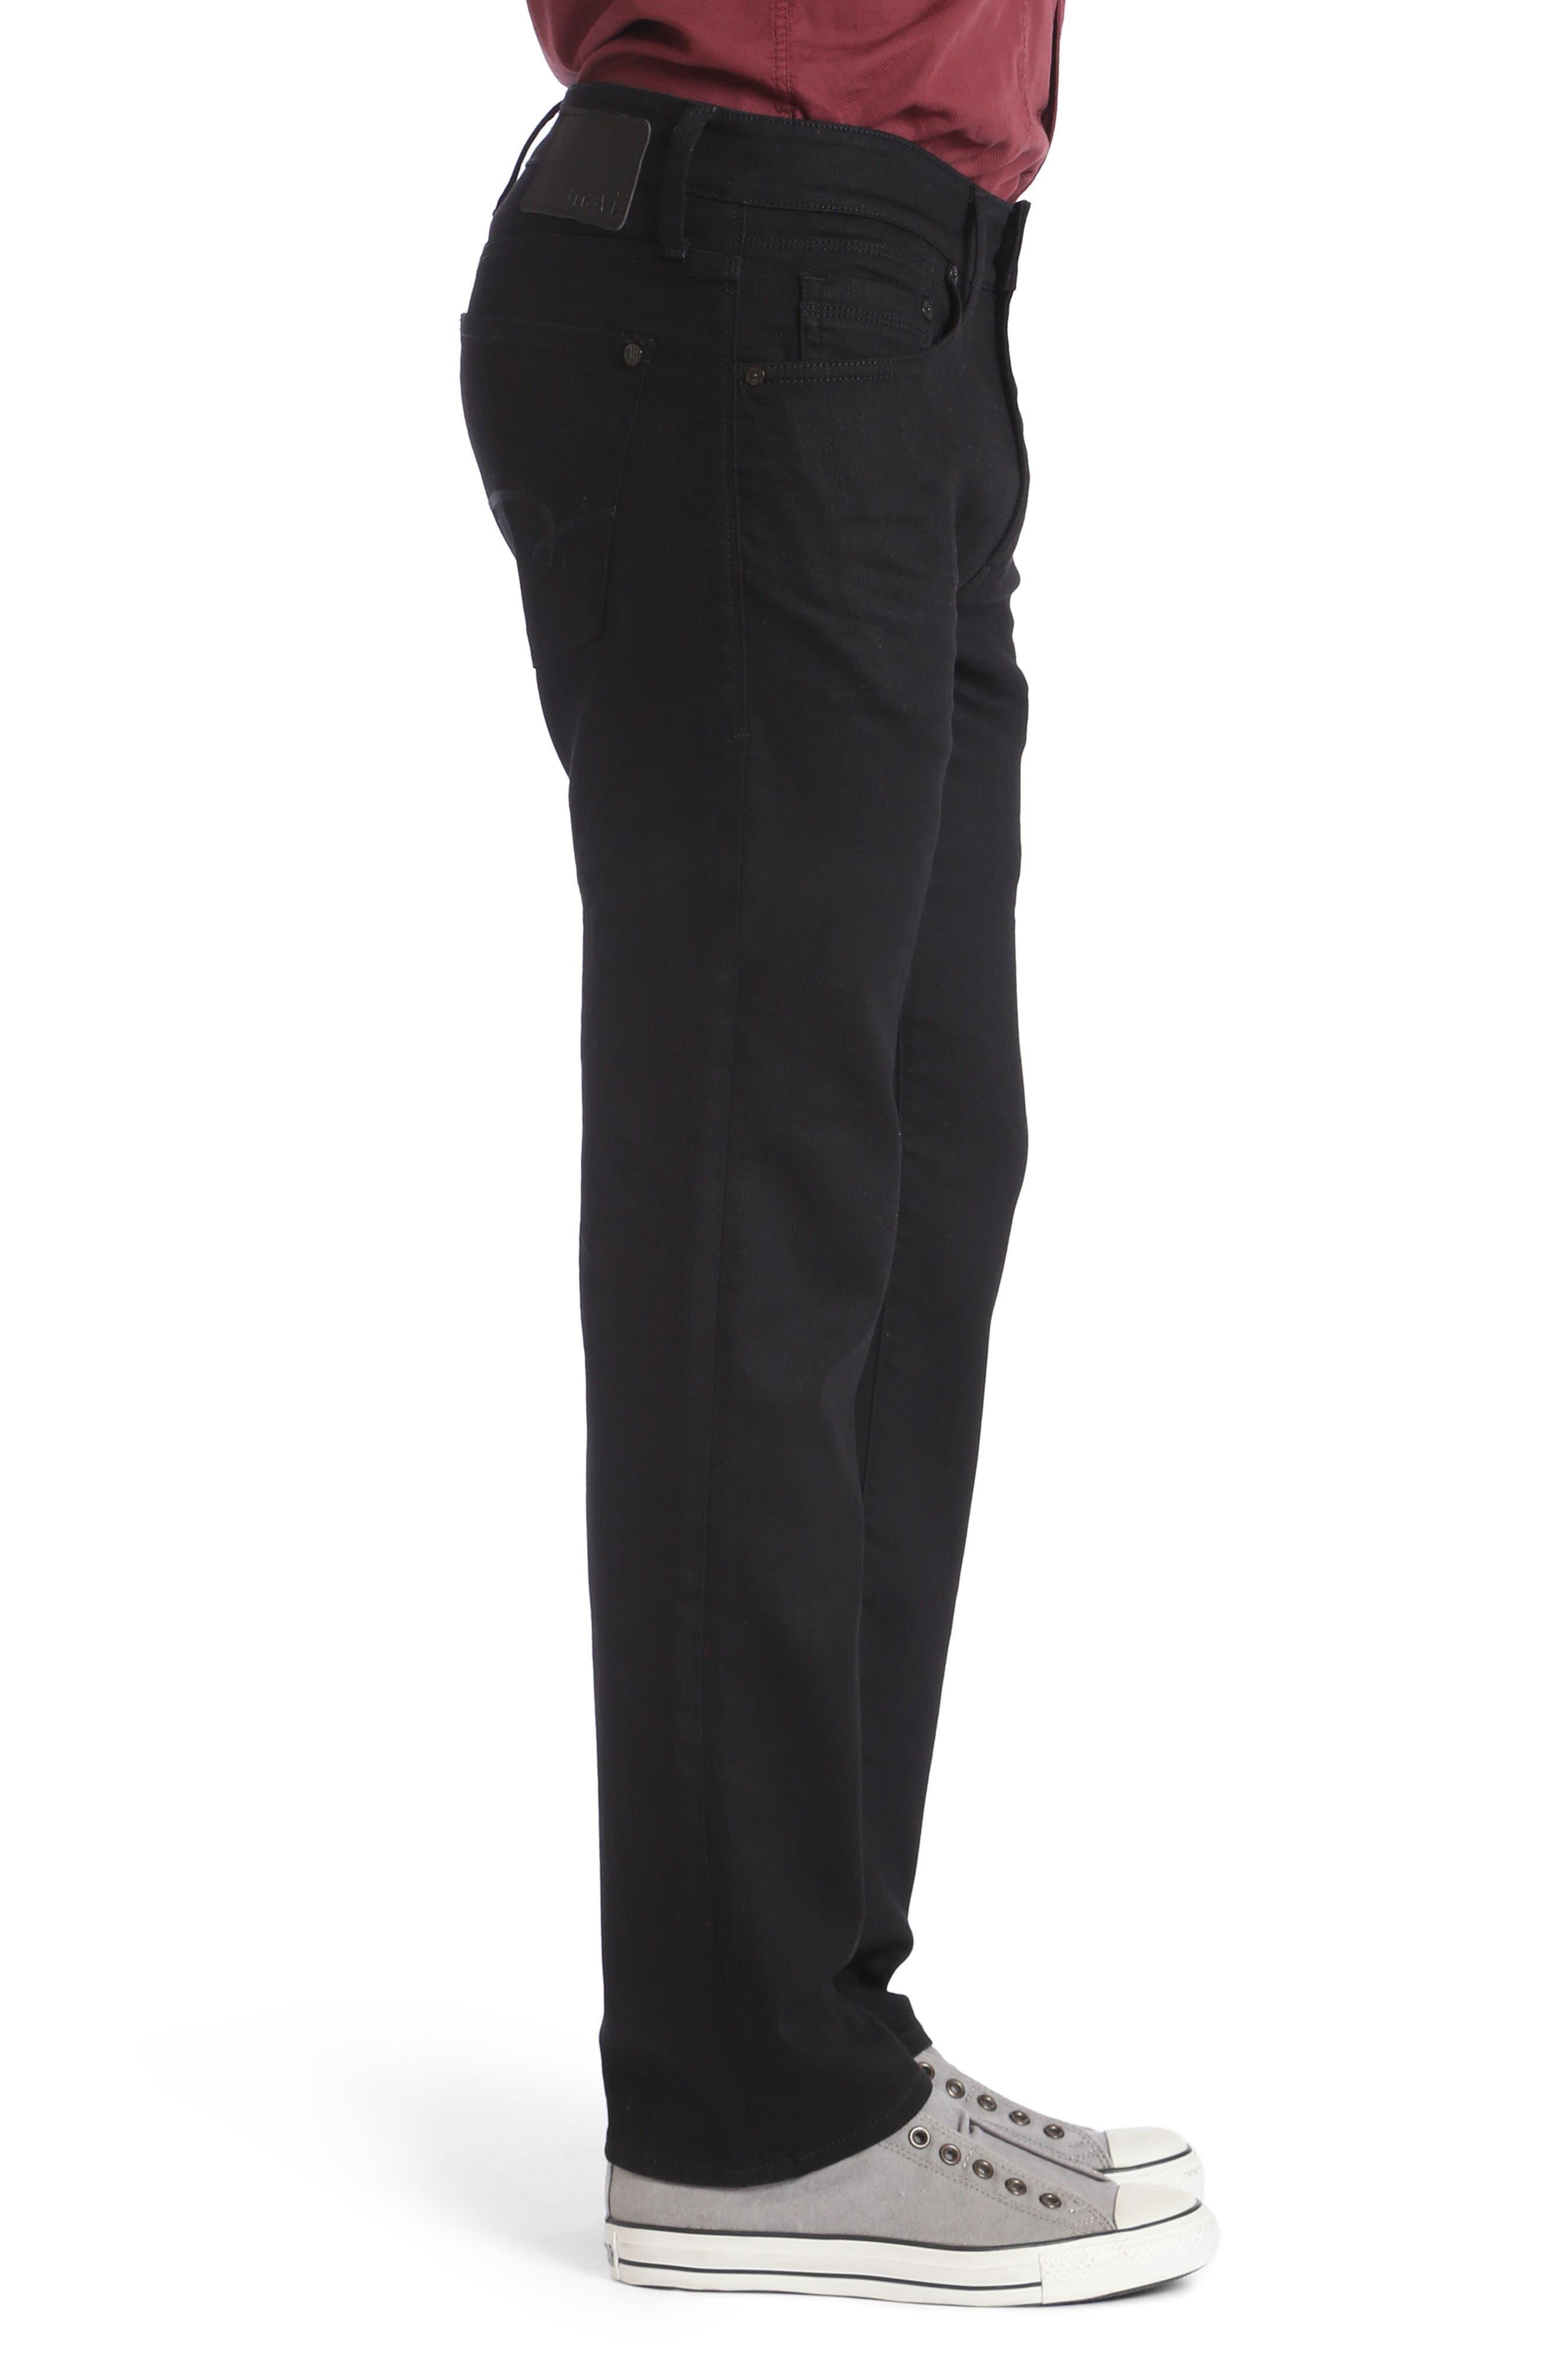 Zach Straight Fit Jeans,                             Alternate thumbnail 3, color,                             001